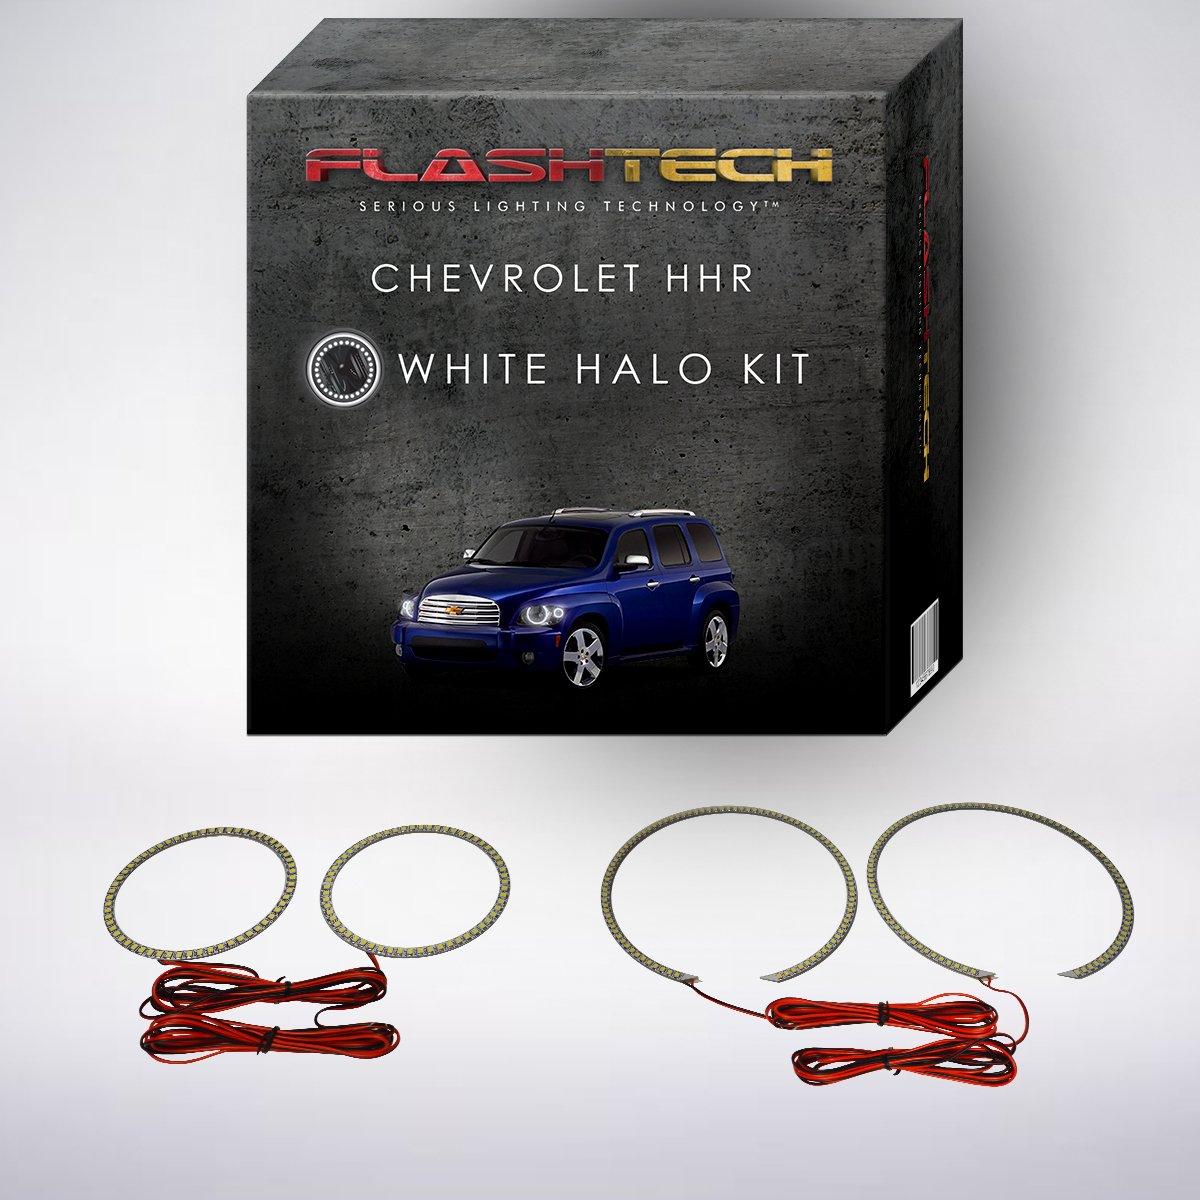 Flashtech Chevrolet Hhr 06 11 Red Single Color Led Halo 2009 Headlight Wiring Harness Ring Kit Automotive